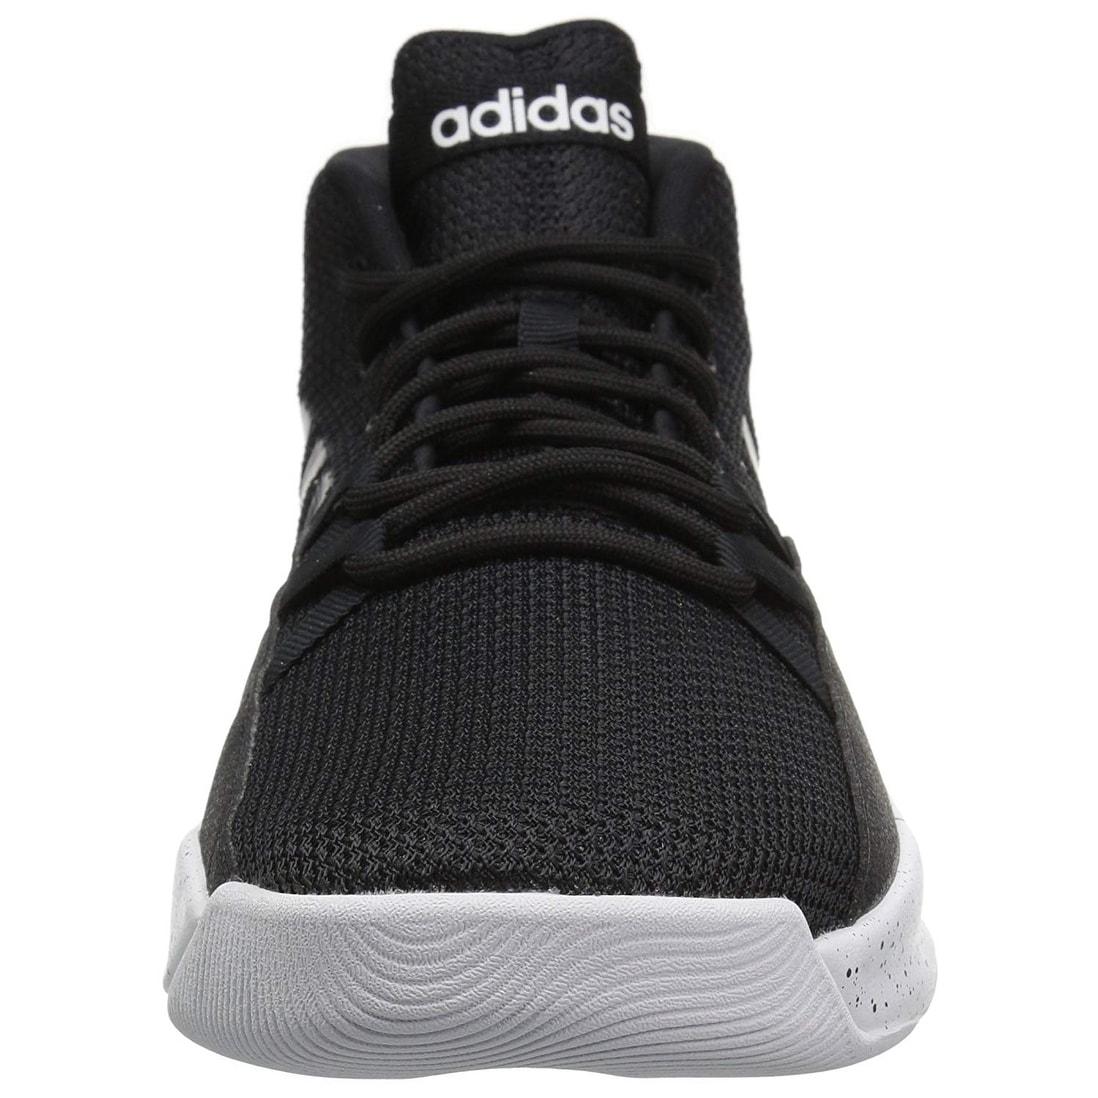 uk availability c3074 16ed2 Shop Adidas Men s Streetfire Basketball Shoe, Black White, 9.5 M Us - Free  Shipping Today - Overstock.com - 25609587